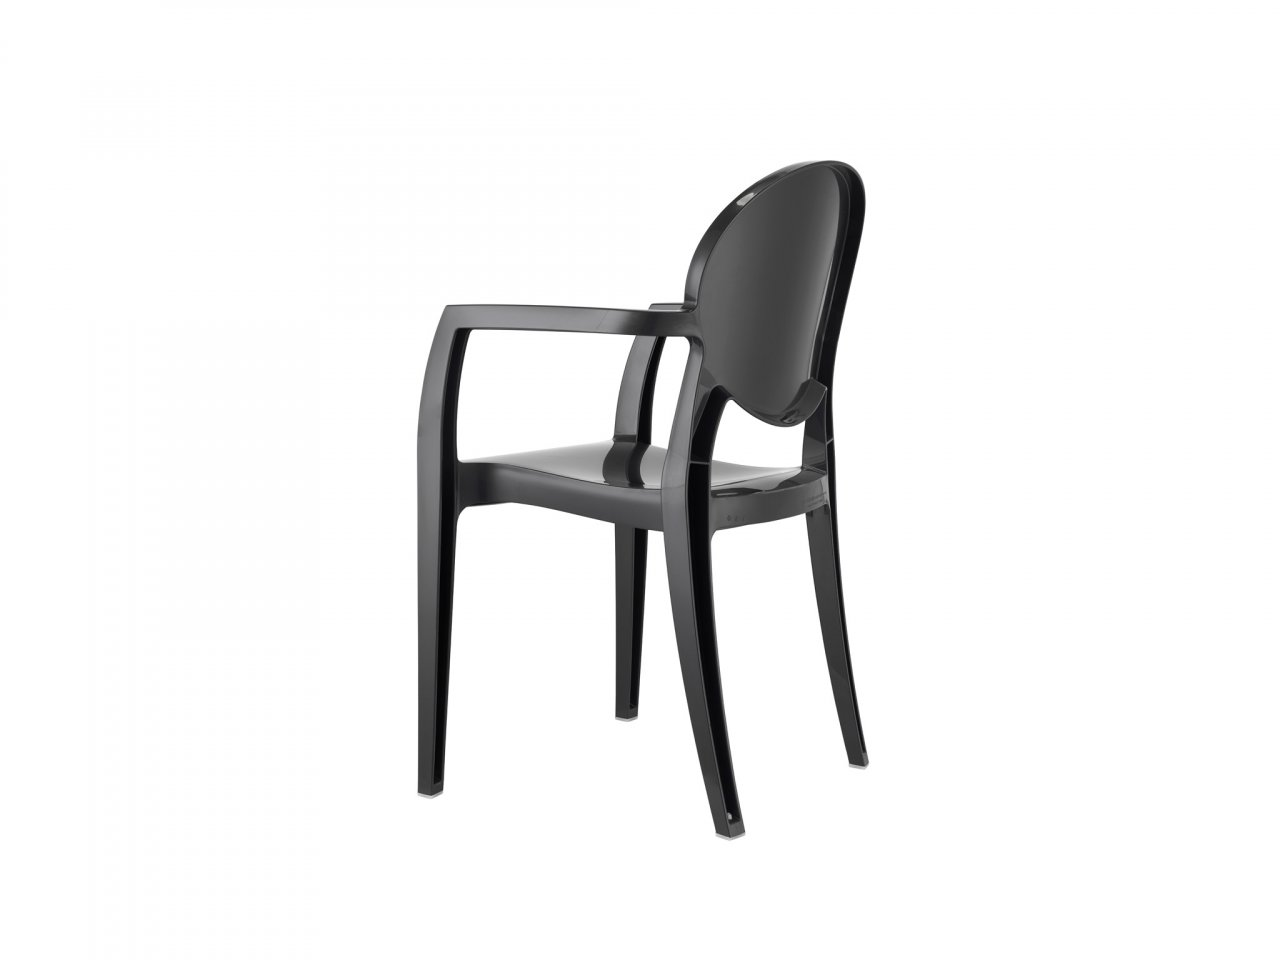 Sedia Con Braccioli Igloo Tecnopolimero -8